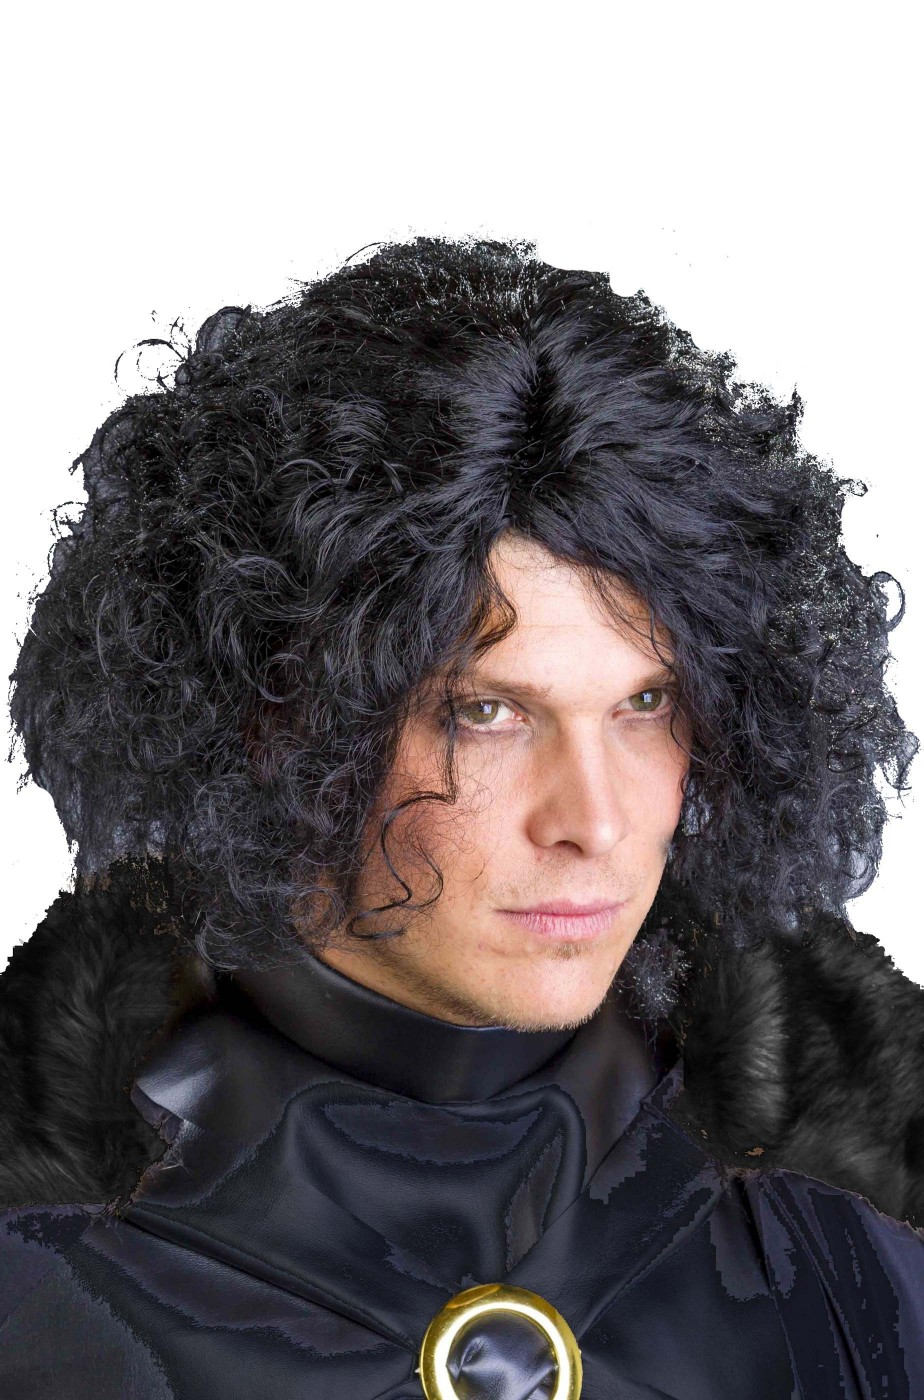 parrucca-di-carnevale-uomo-nera-mossa-senza-frangia-jon-snow-emo.jpg d6c24727f1e1